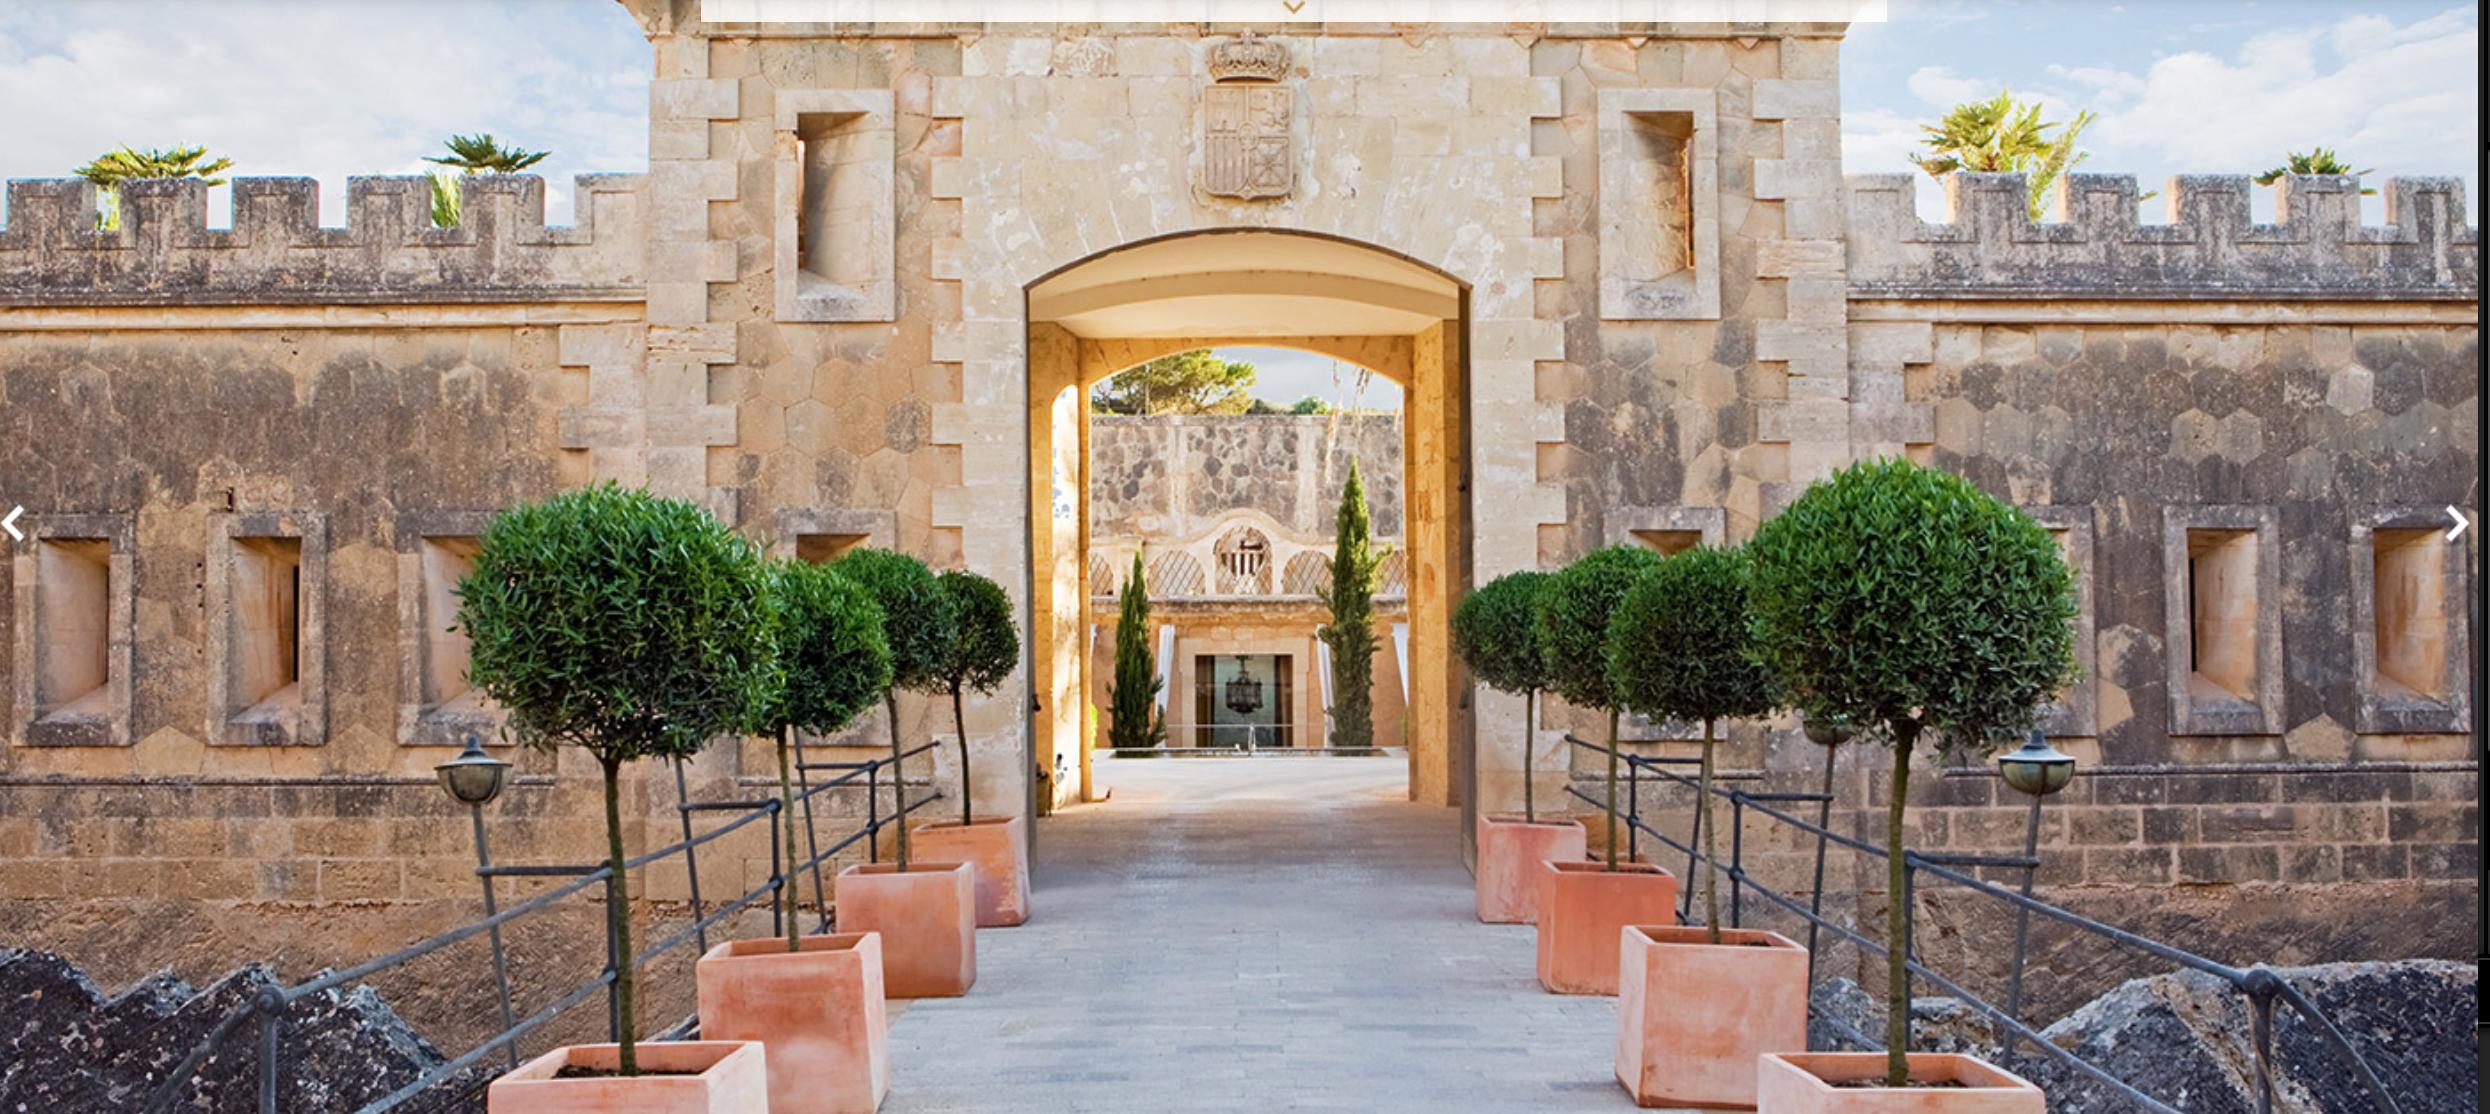 ROSE & IVY Journal Cap Rocat Mallorca